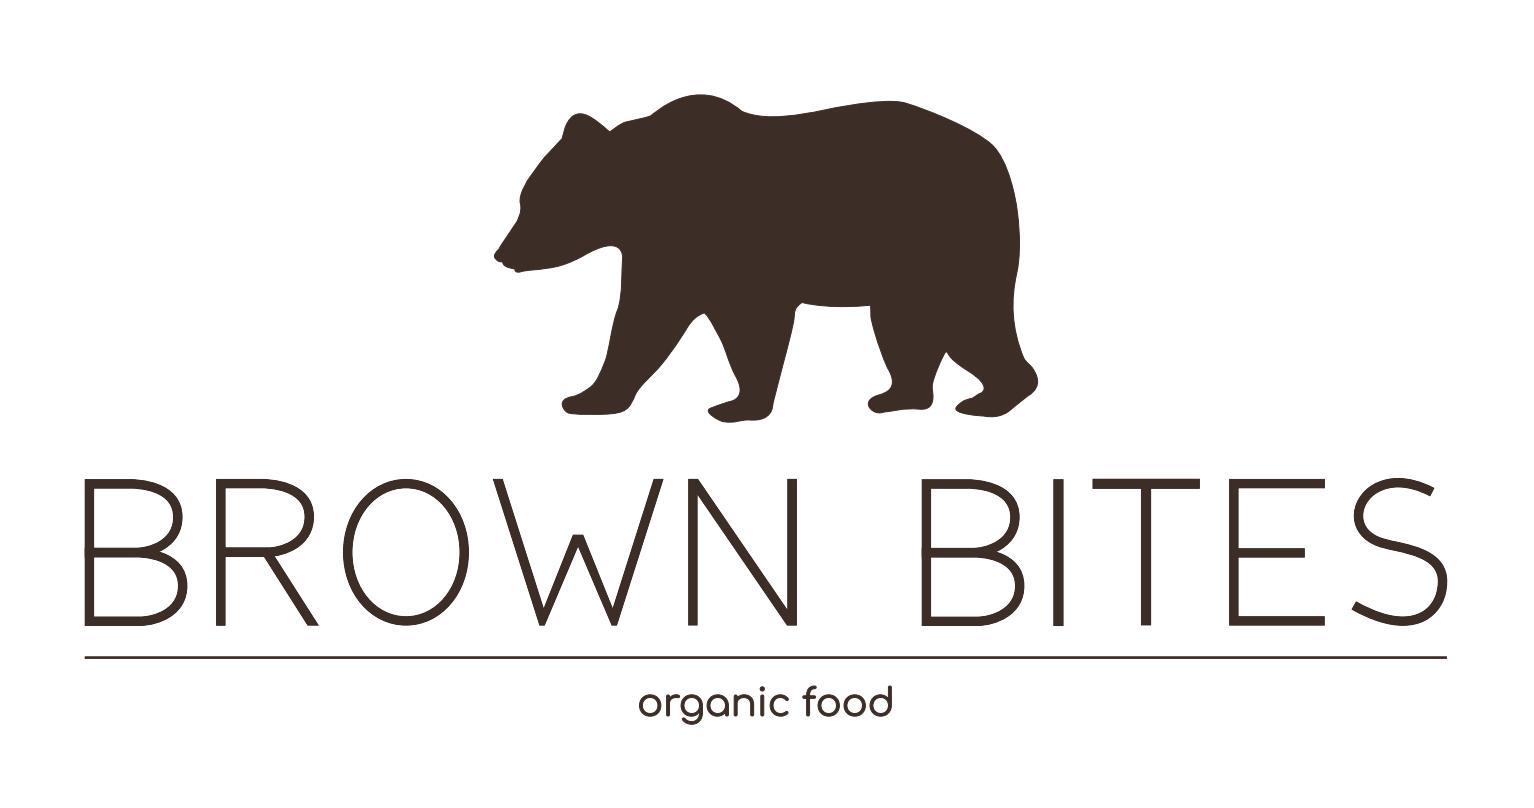 Alimento orgánico para mascotas